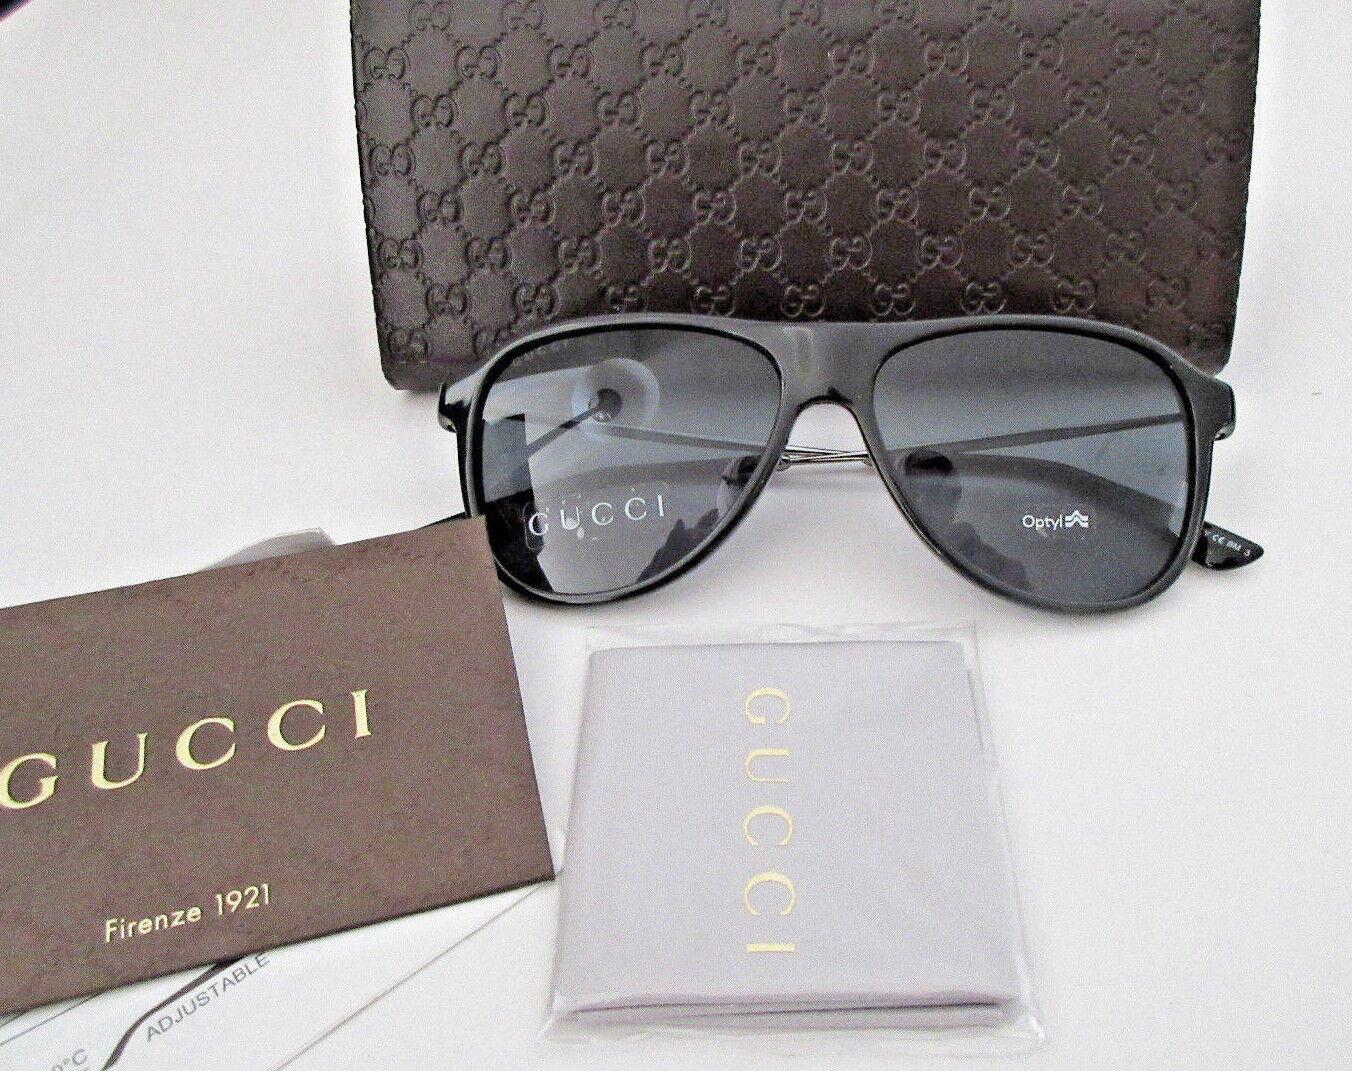 5aa19b6fd Gucci Unisex Black Optyl Aviator Sunglasses GG 1058/S CVSBN